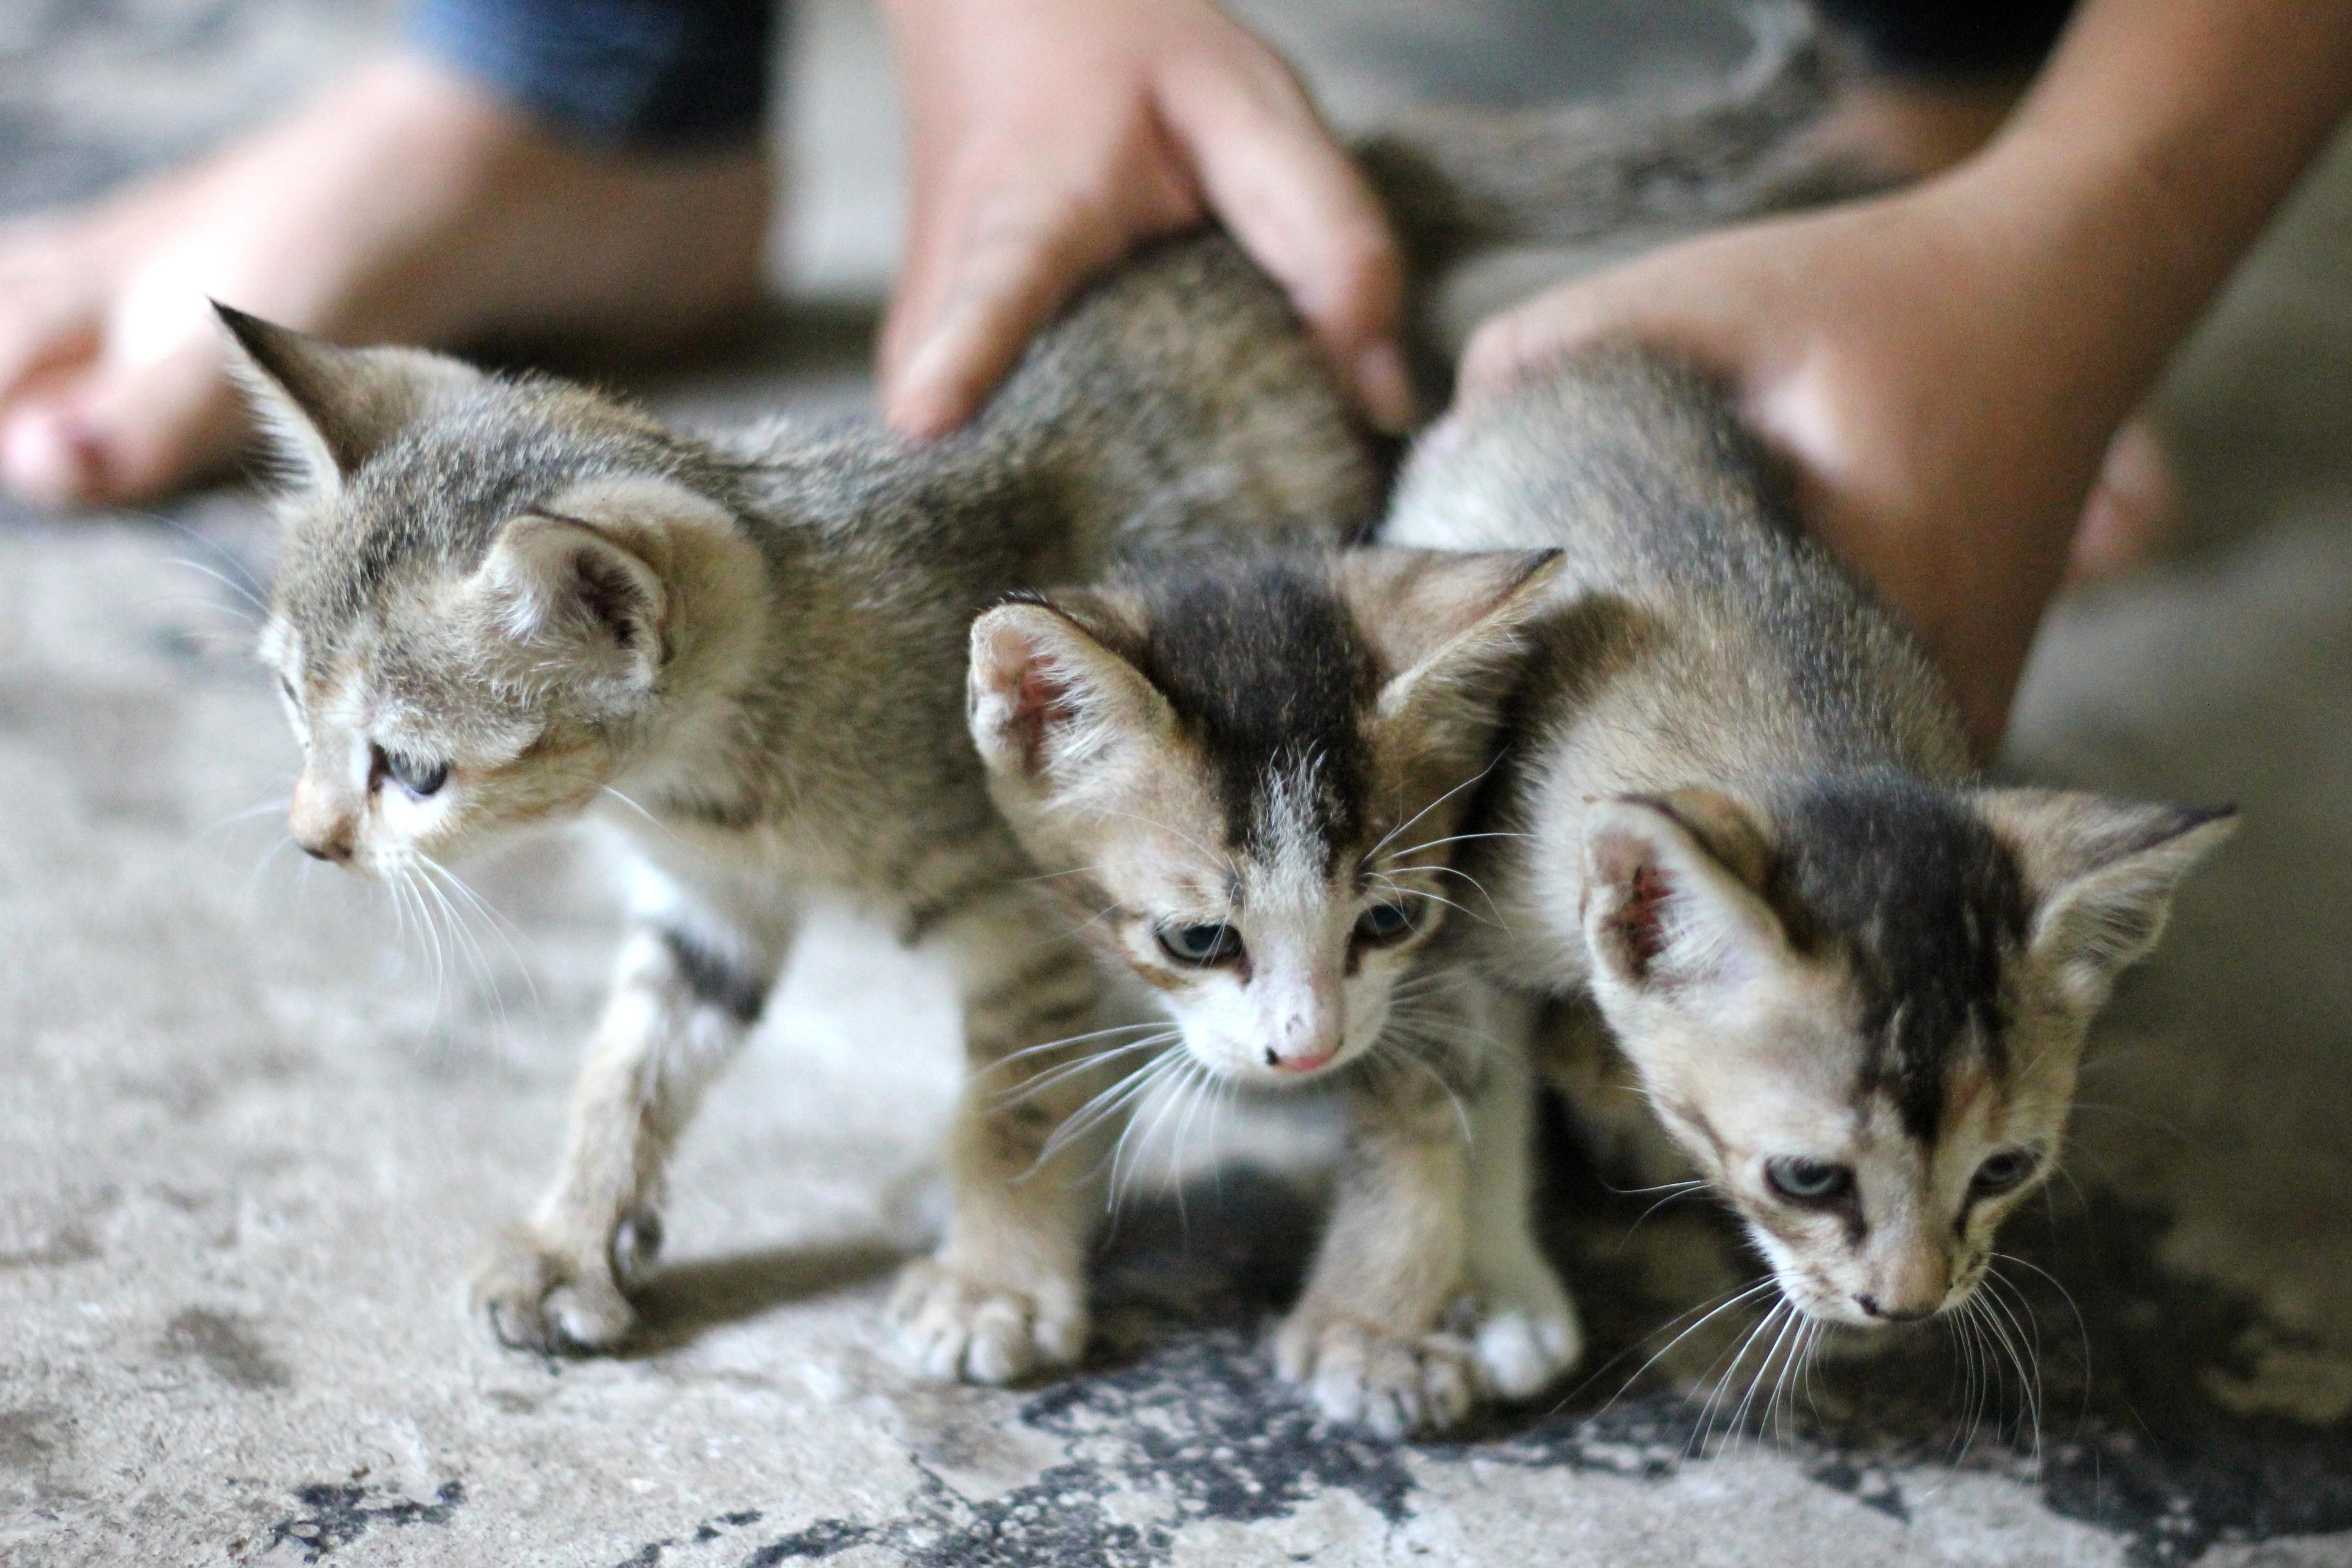 Free picture: cat, kitten, animal, feline, fur, pet, domestic cat ...